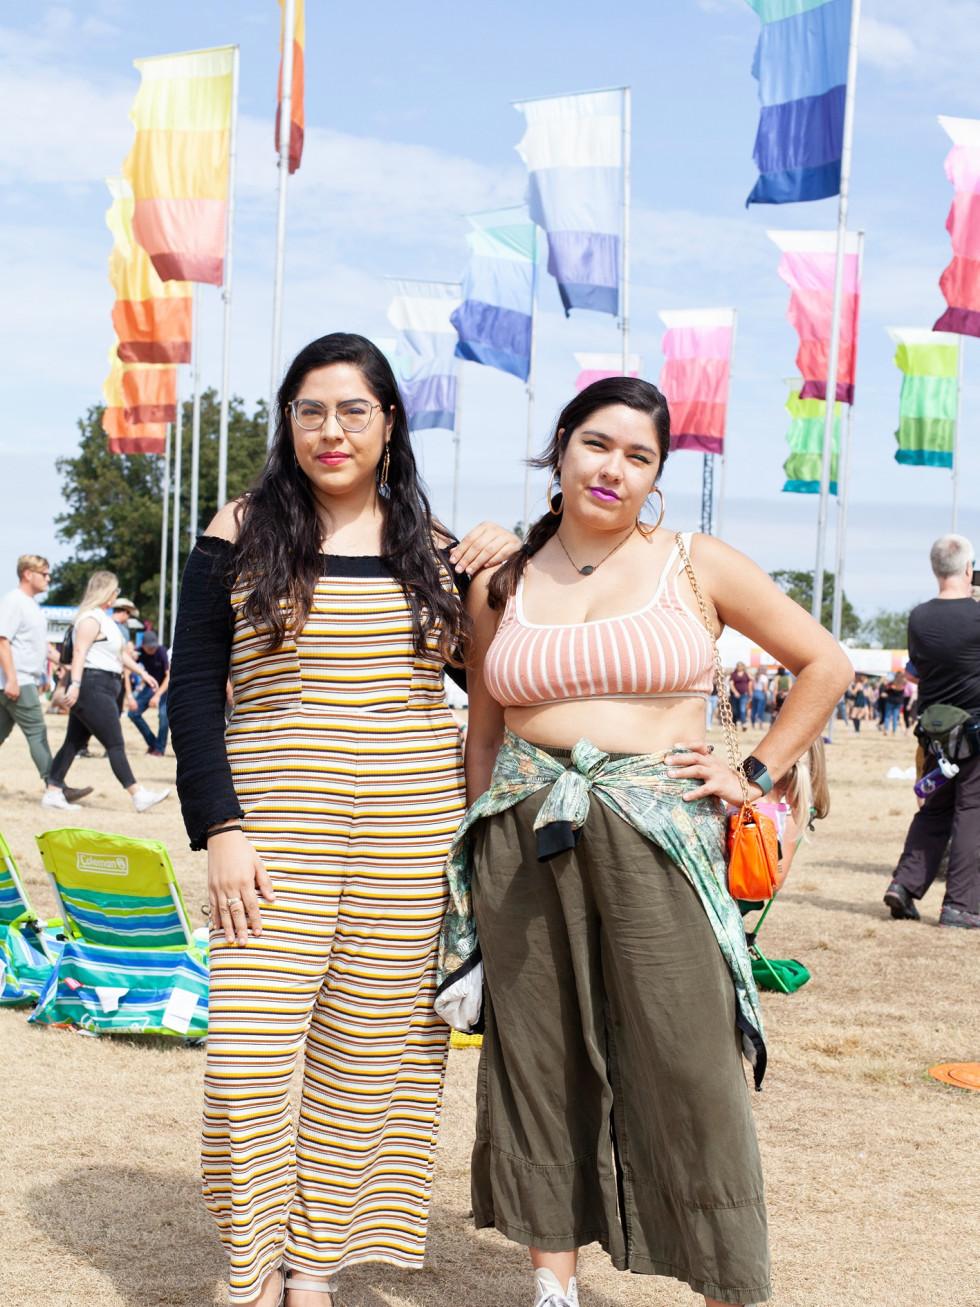 Fashion at Austin City Limits Festival 2019